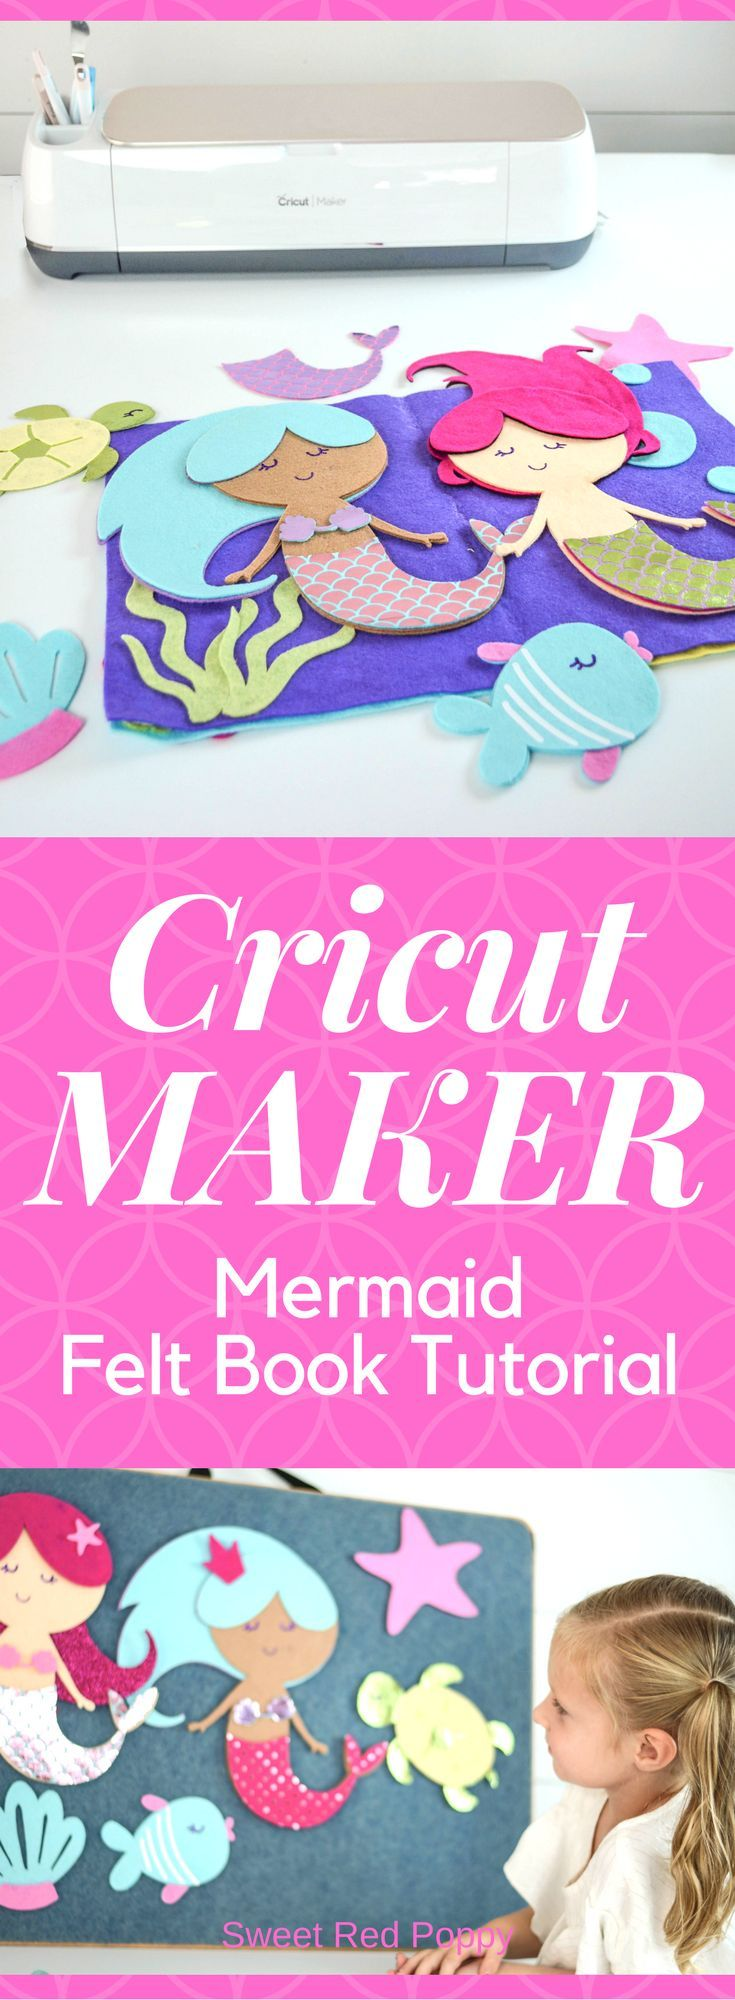 Mermaid Felt Busy Quiet Book Tutorial featuring the Cricut Maker